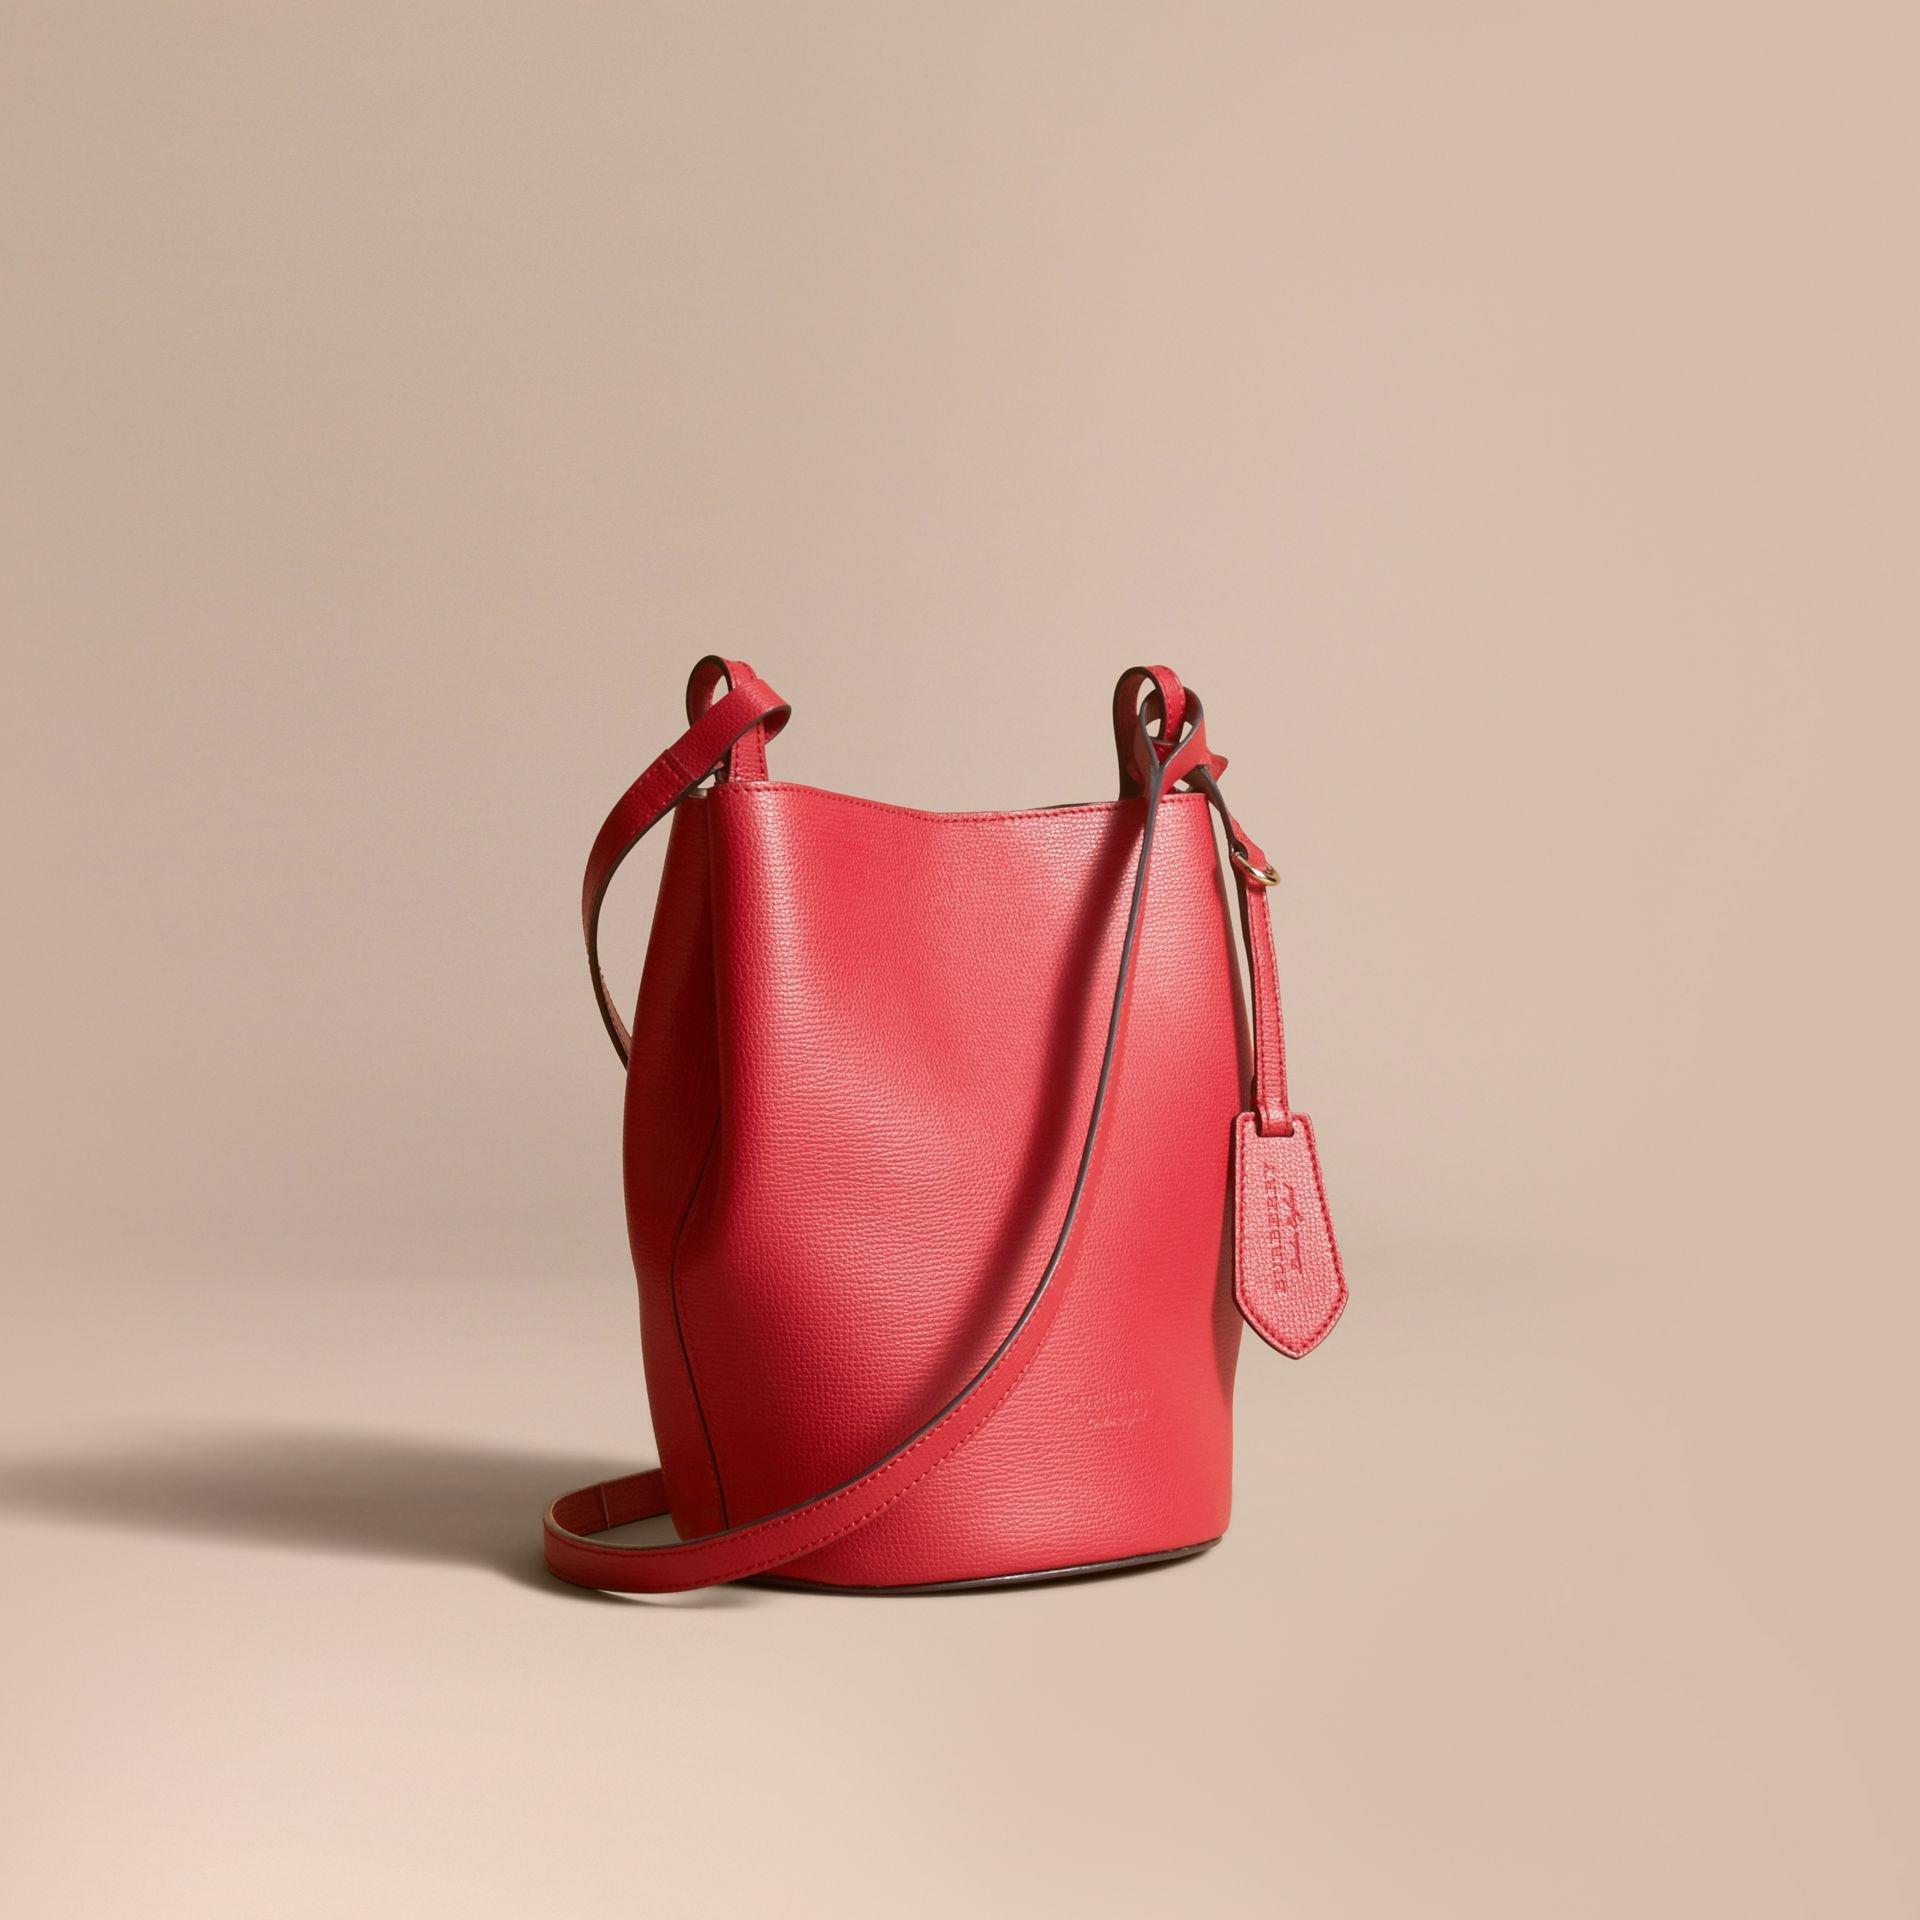 Lyst - Burberry Leather And Haymarket Check Bucket Crossbody Bag ... ef83419156daa